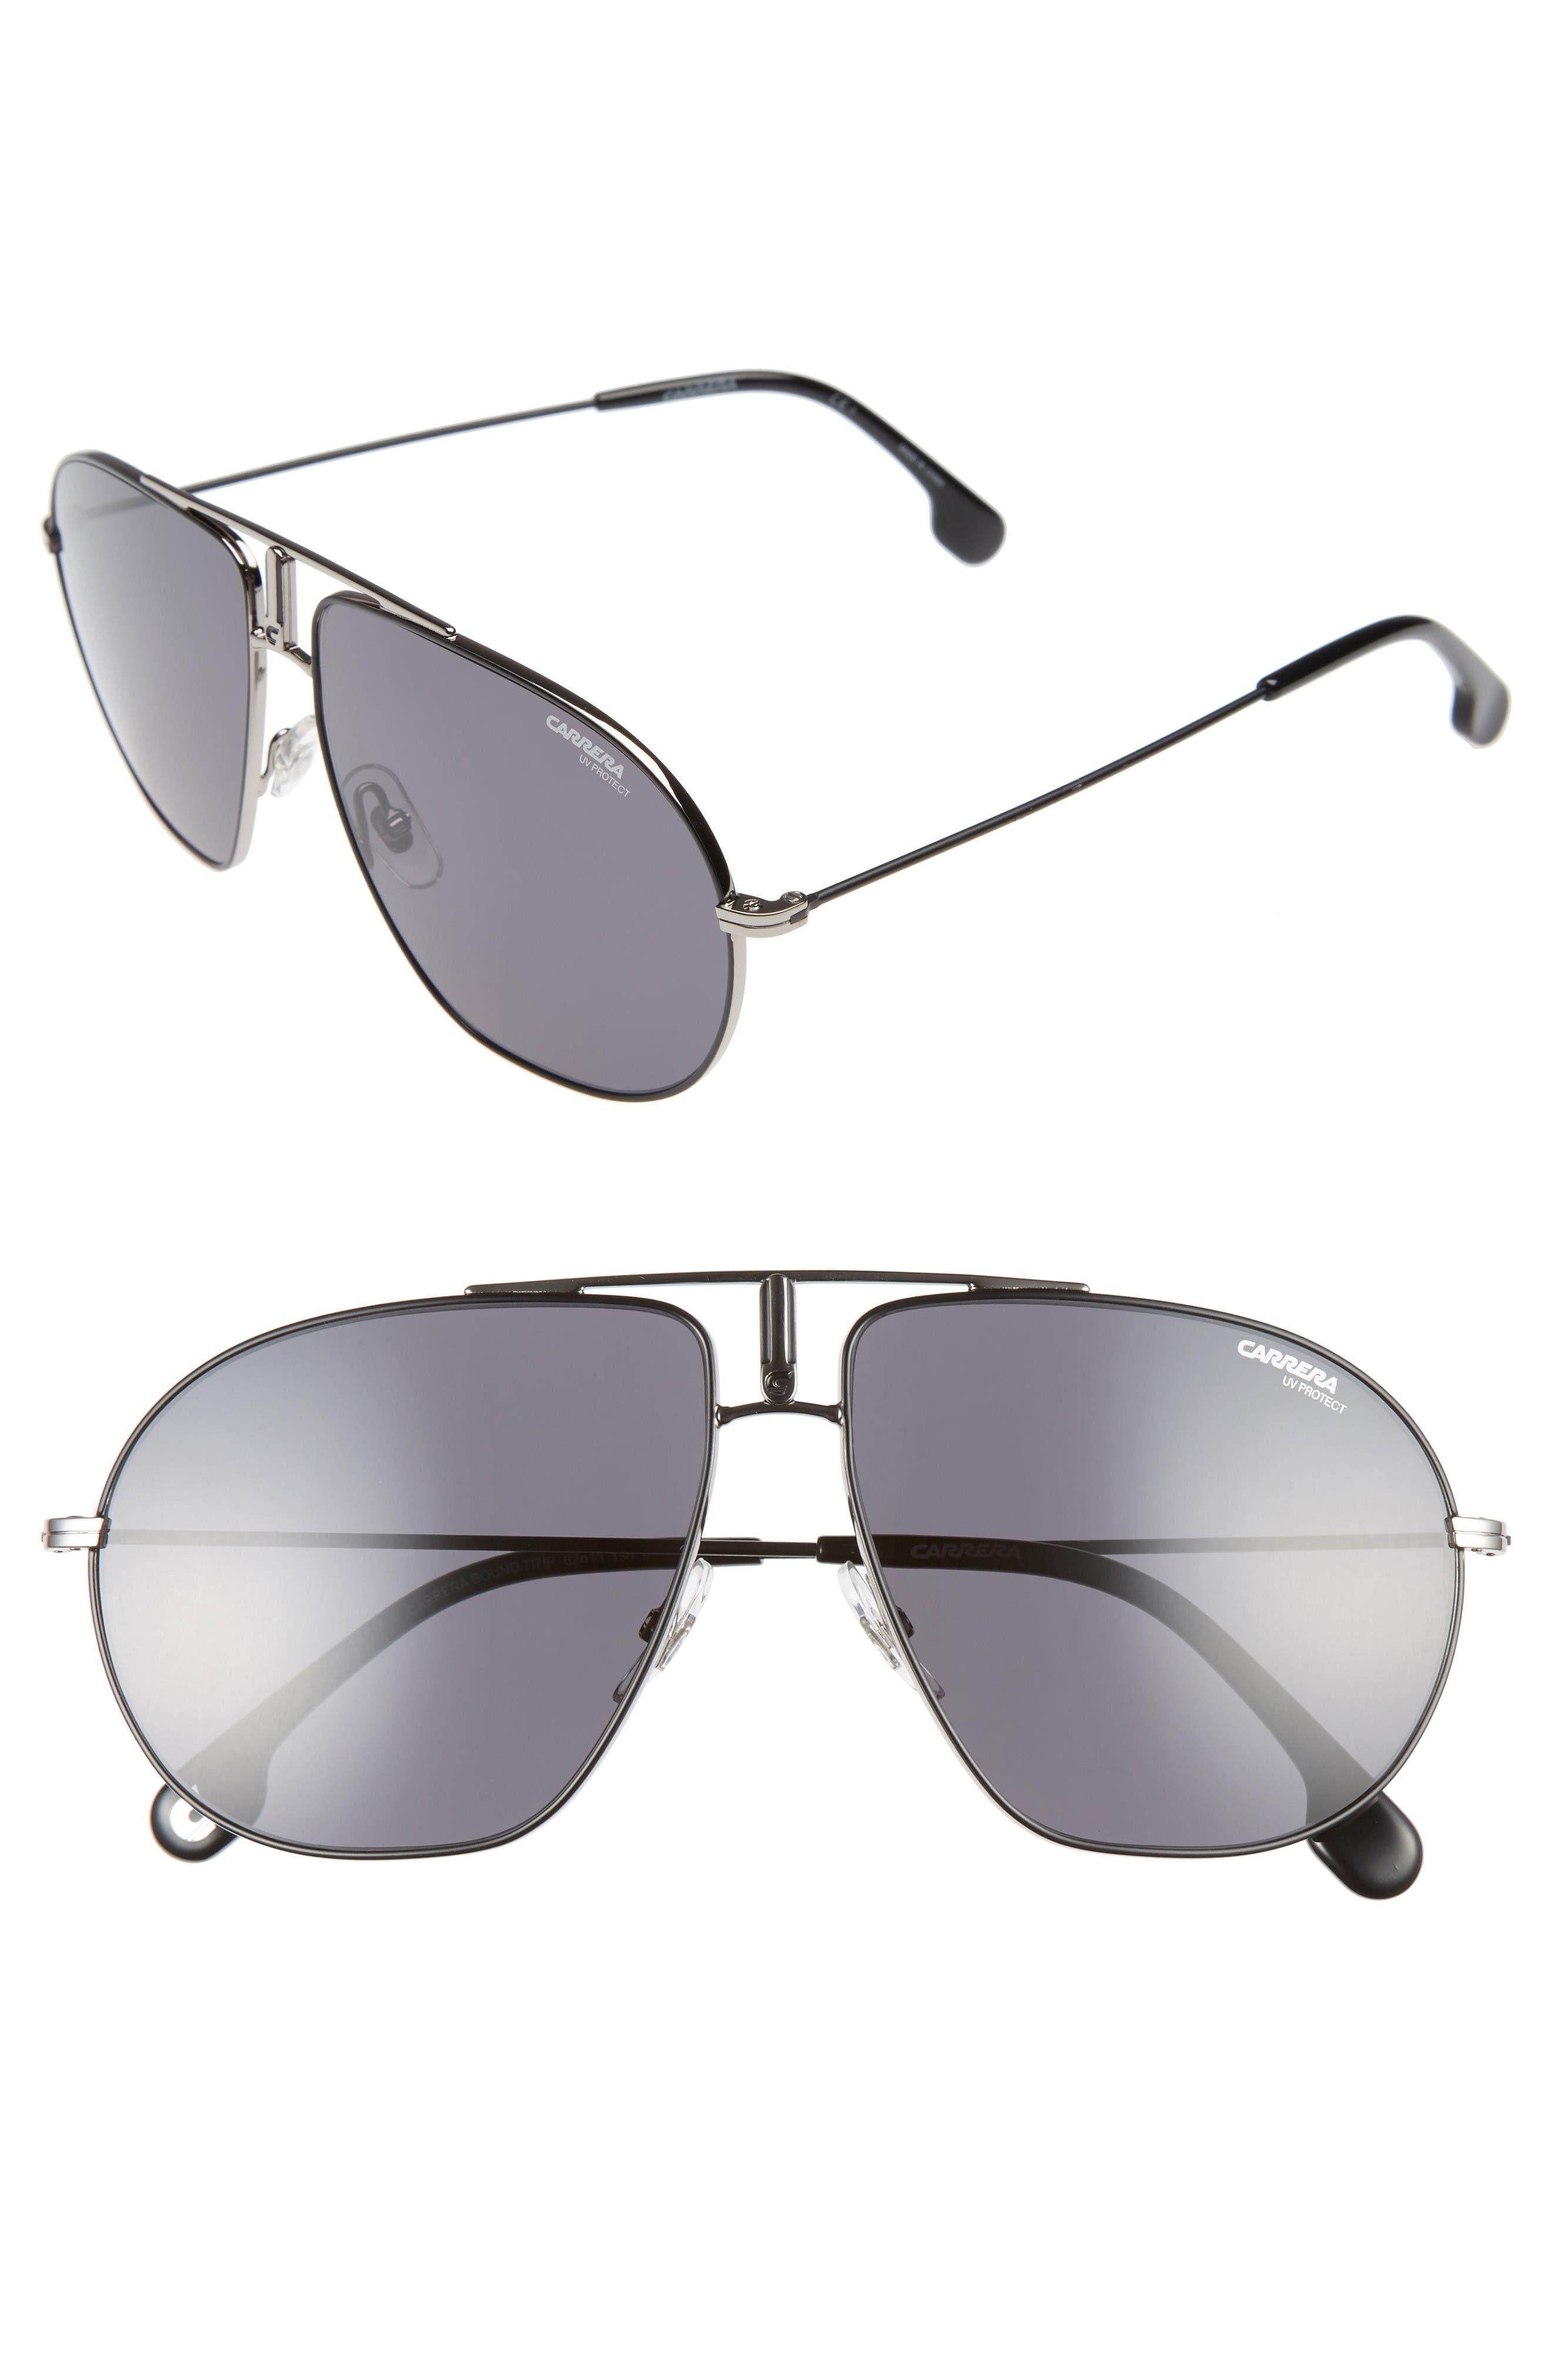 Main Image - Carrera Eyewear Bounds 62mm Gradient Aviator Sunglasses